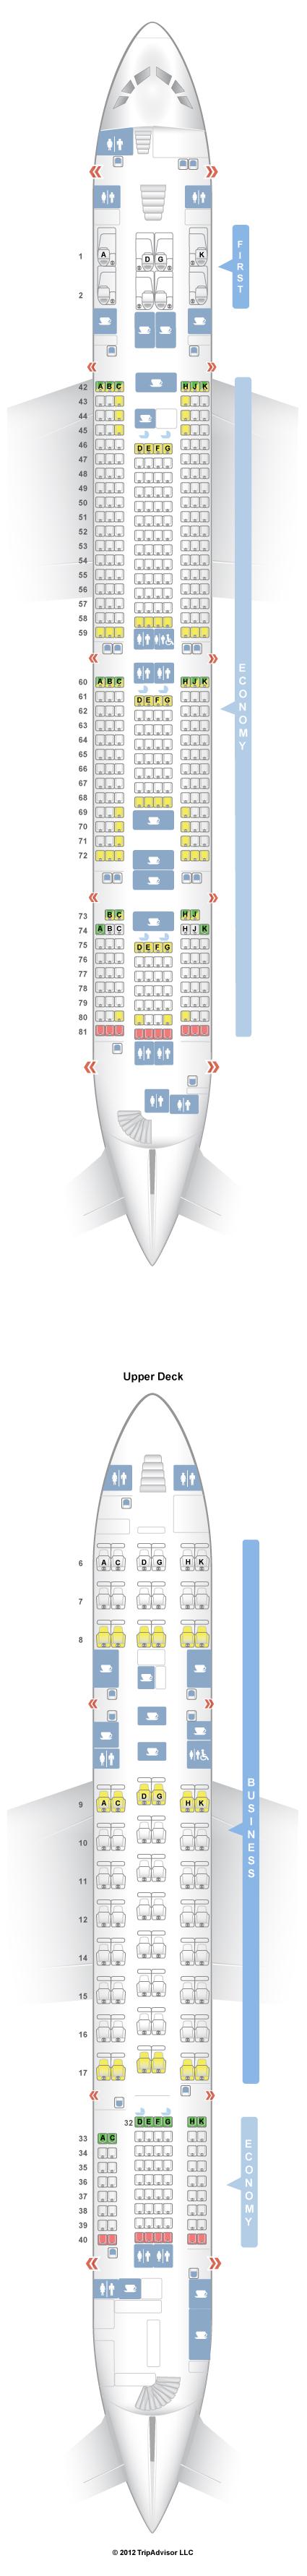 Seatguru Seat Map Malaysia Airlines Airbus A380 800